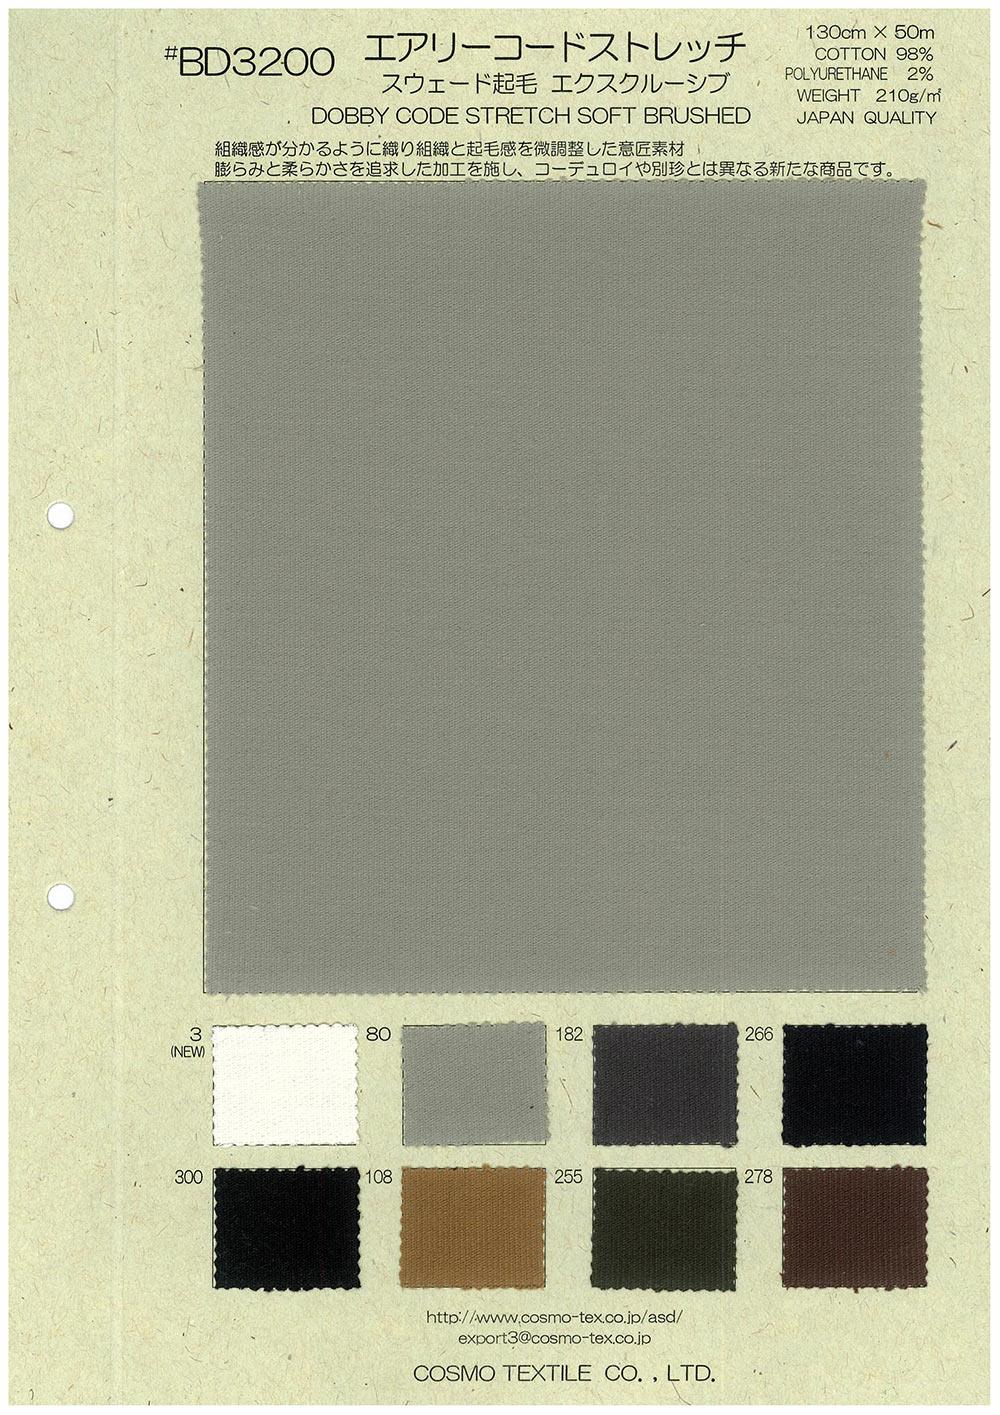 BD3200 エアリーコードストレッチ[生地] コスモテキスタイル/オークラ商事 - ApparelX アパレル資材卸通販